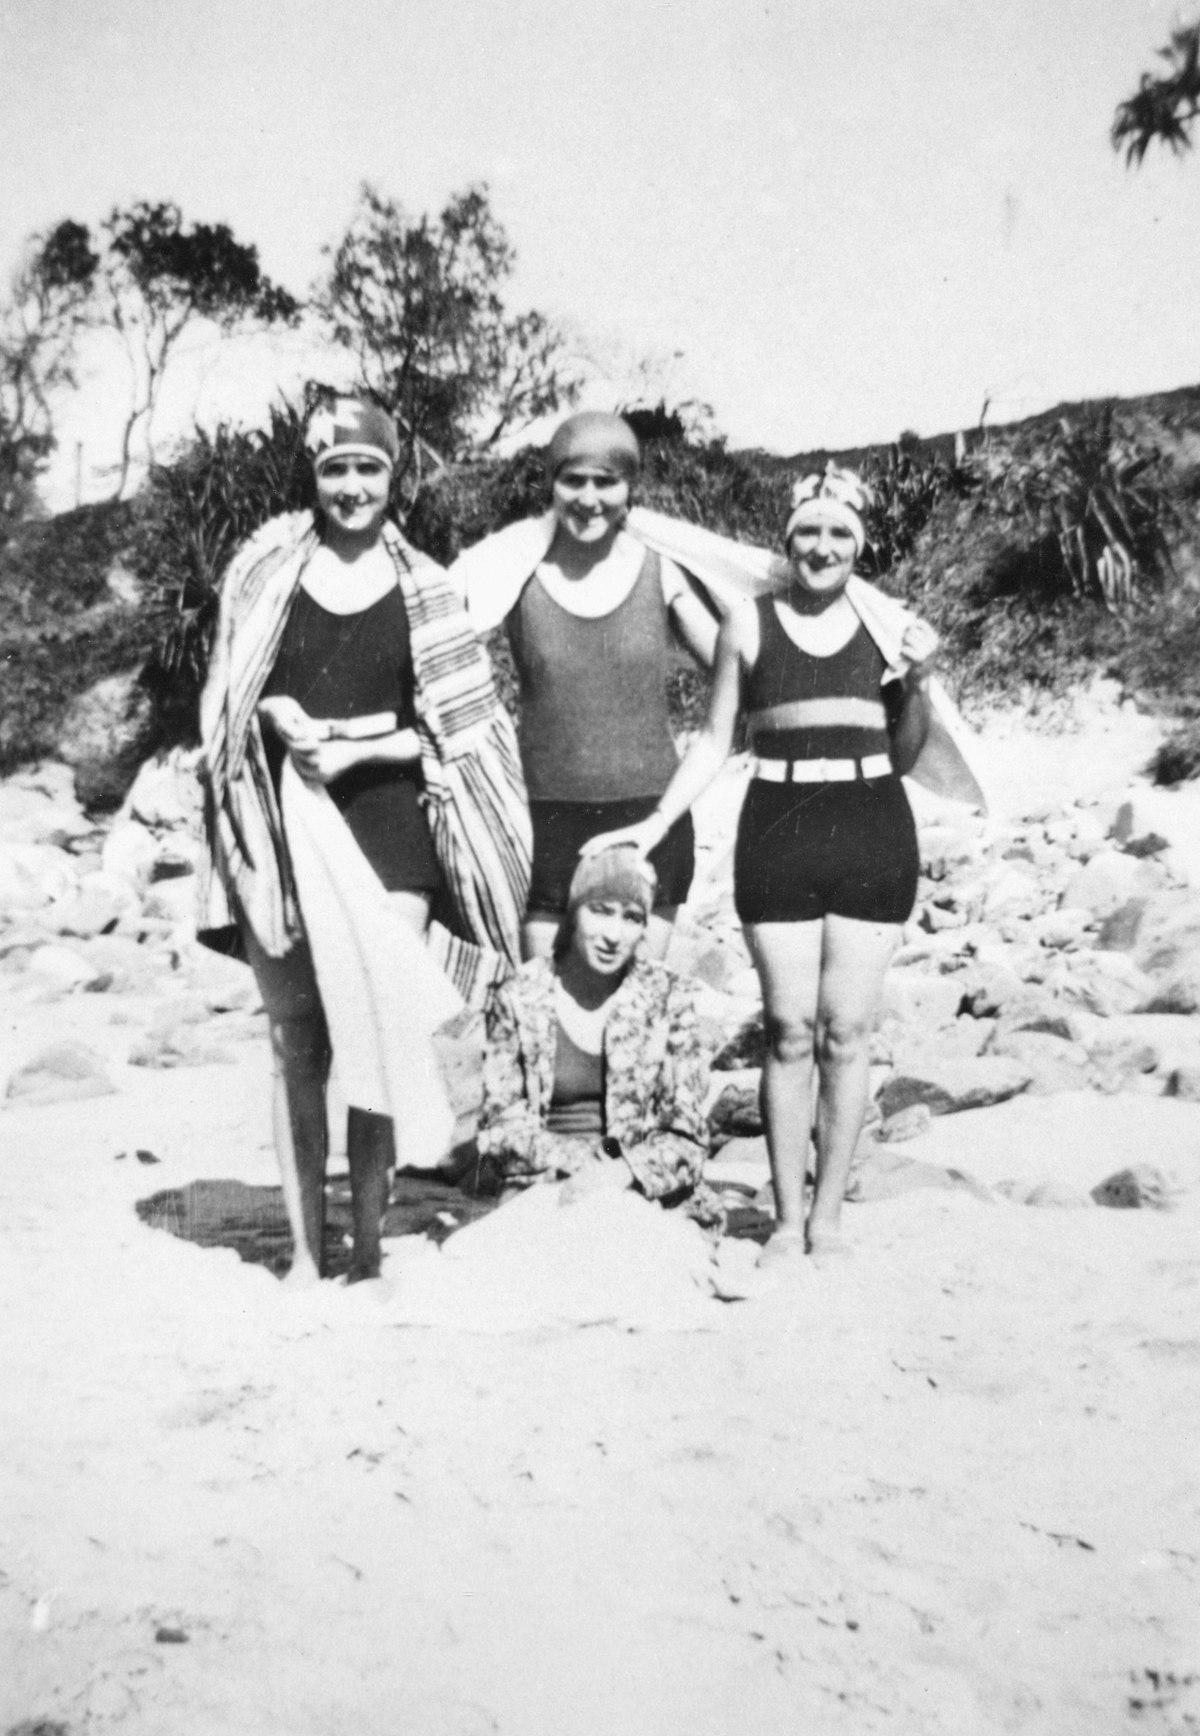 File:Bathers Enjoying A Day At Coolum Beach, 1929